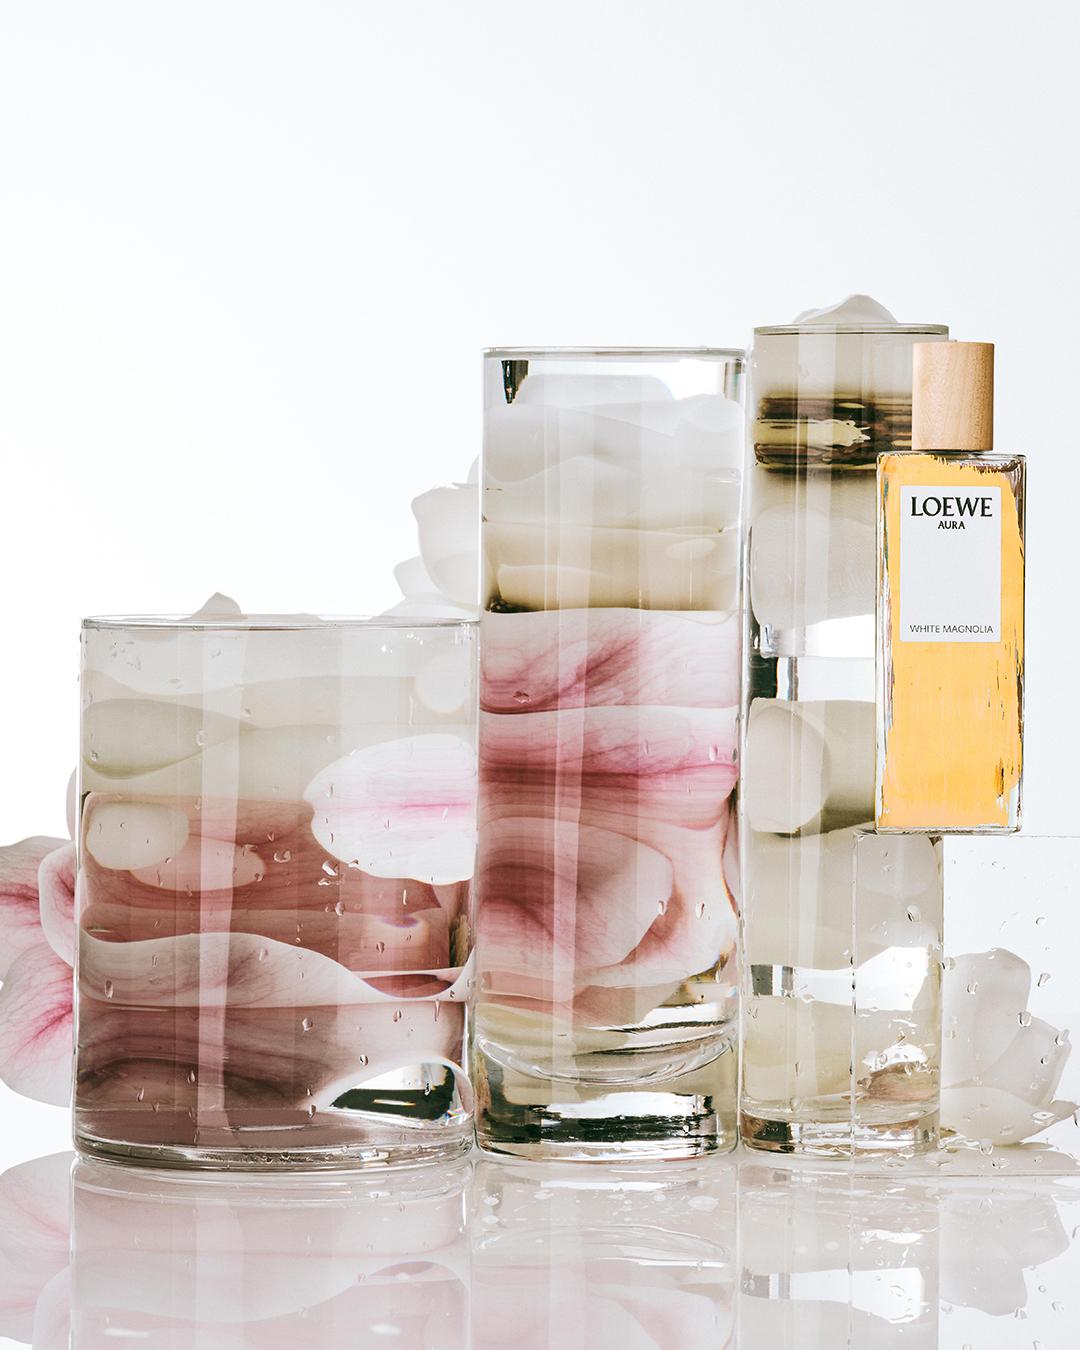 Loewe Aura White Magnolia  Eau de Parfum